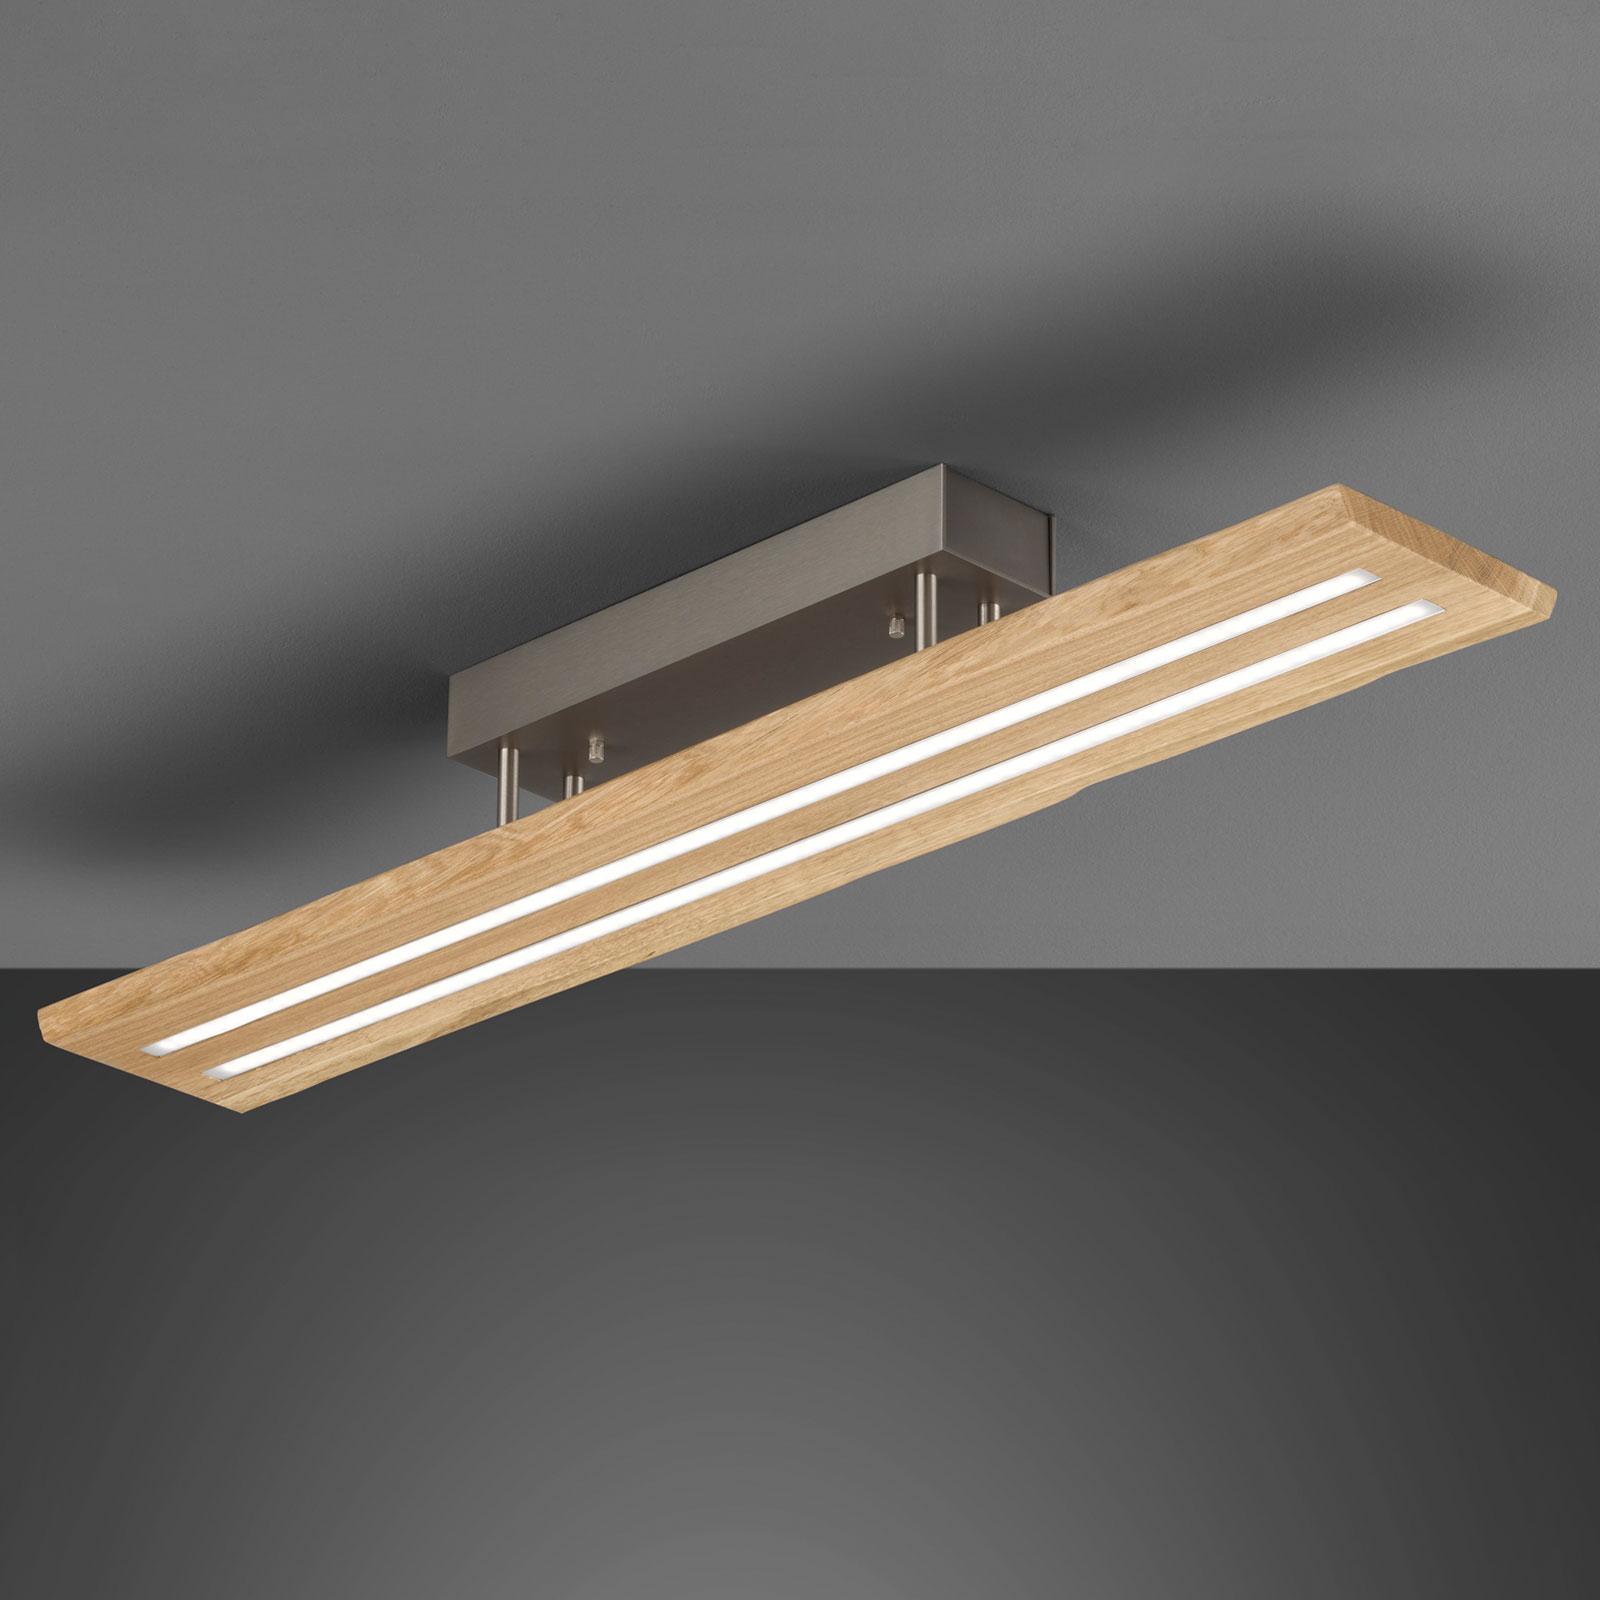 Naturholz-LED-Deckenlampe Cyra, Baumkantenoptik